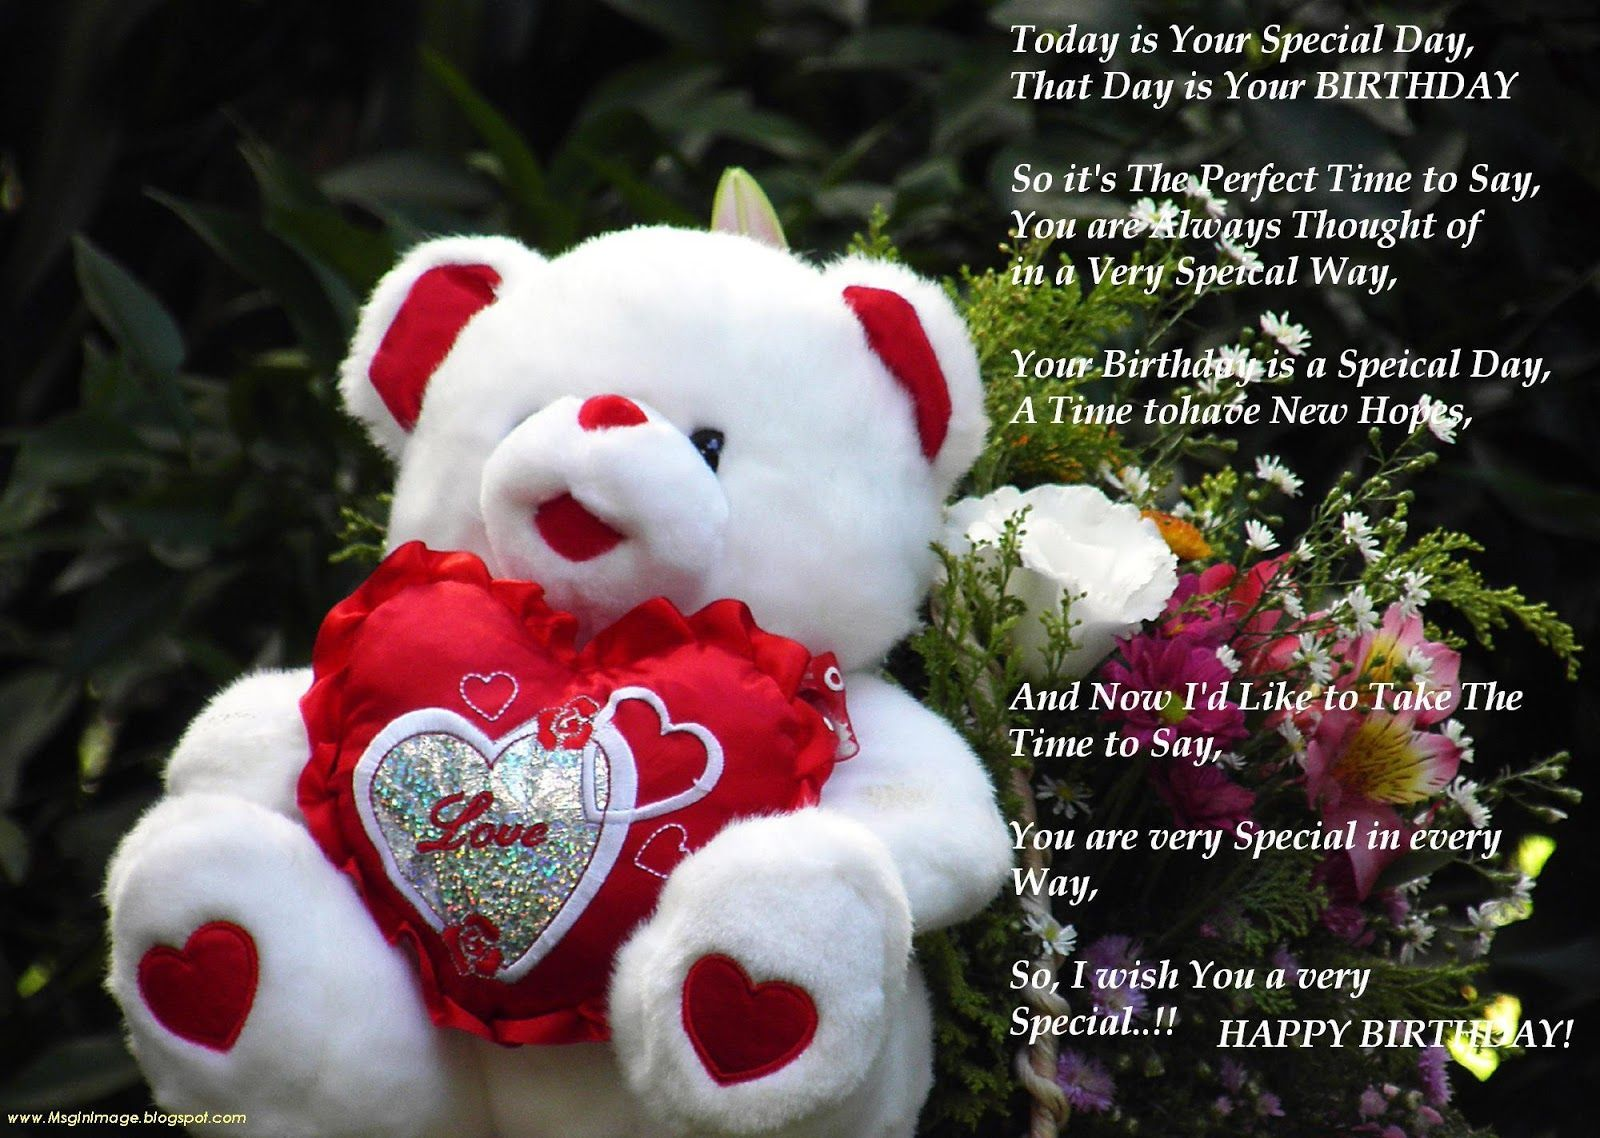 Happy Birthday Love Quoteshappybirthdaywishesonline – Birthday Love Greeting